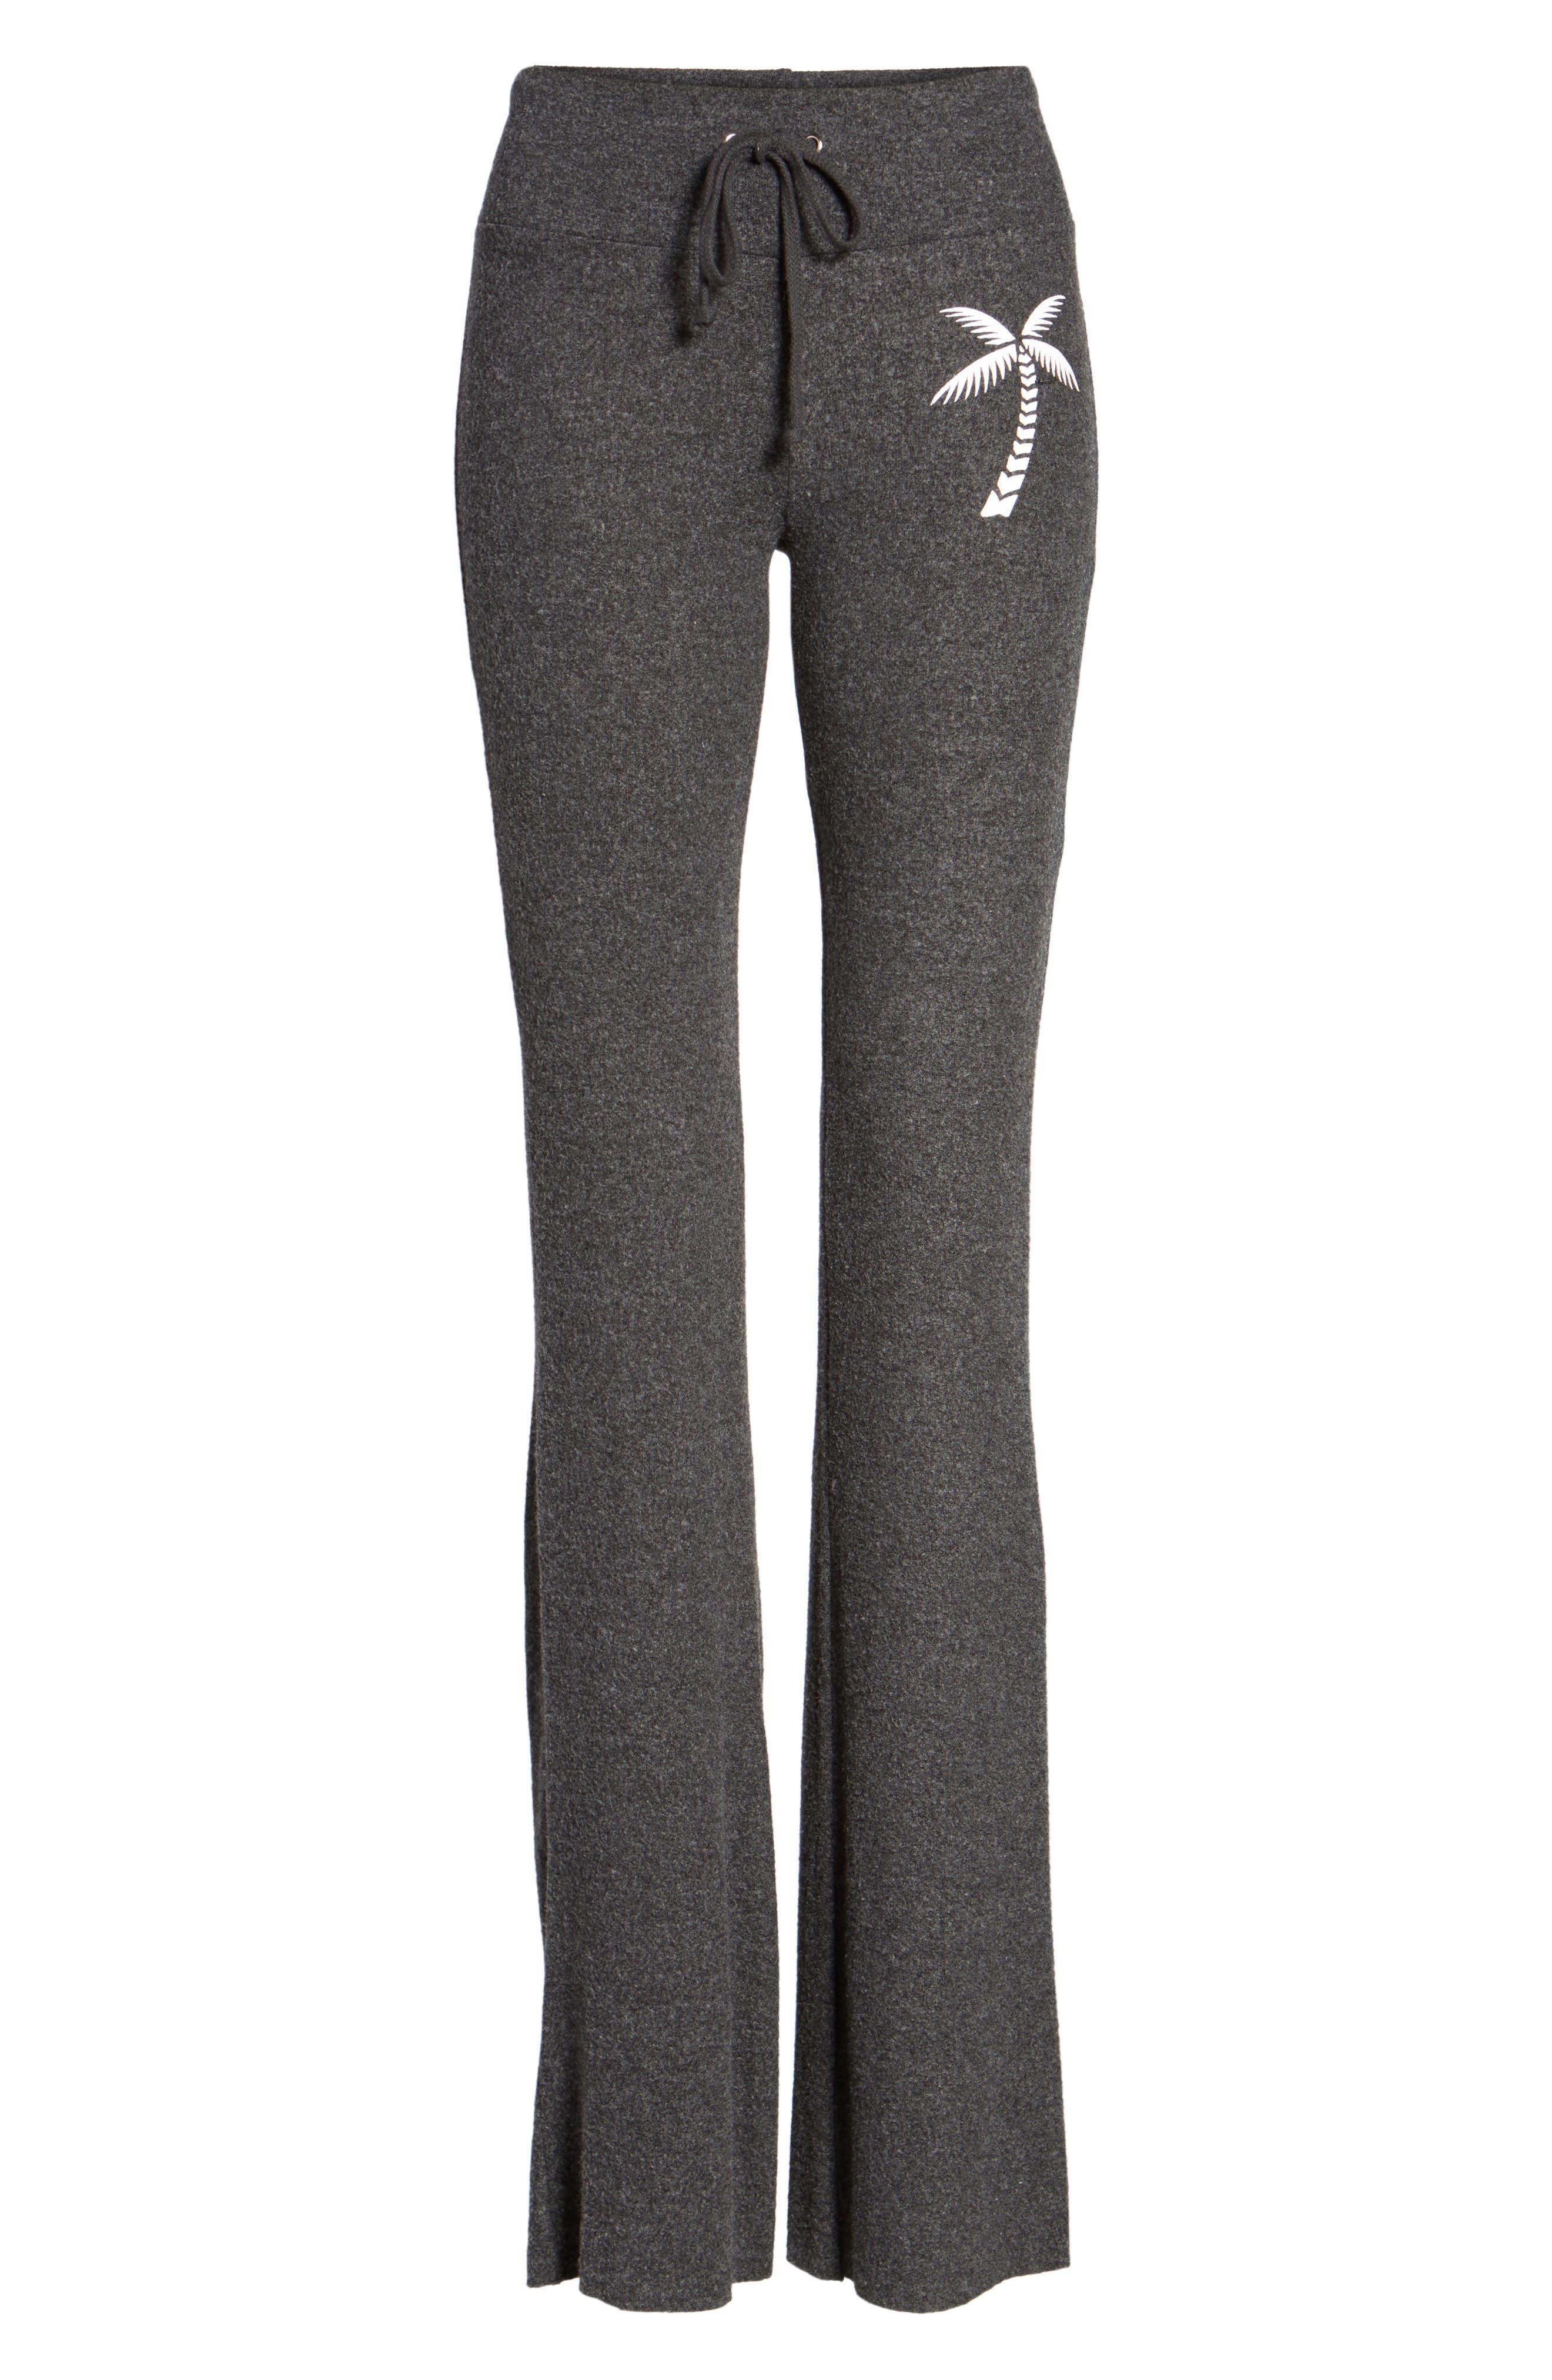 Salty Hair Track Pants,                             Alternate thumbnail 6, color,                             Black